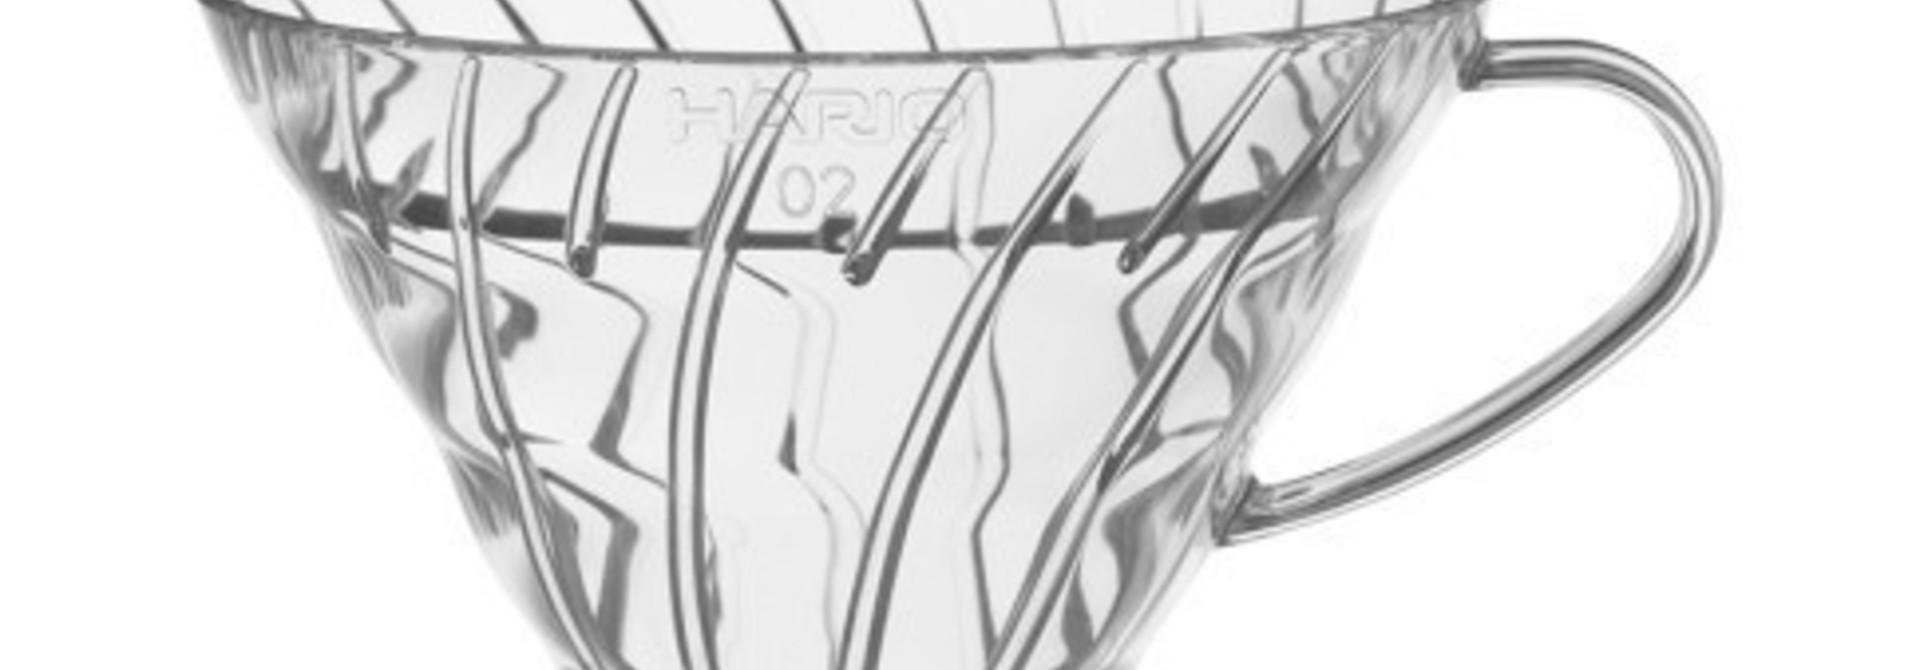 Hario V60 Plastic dripper (02) Clear